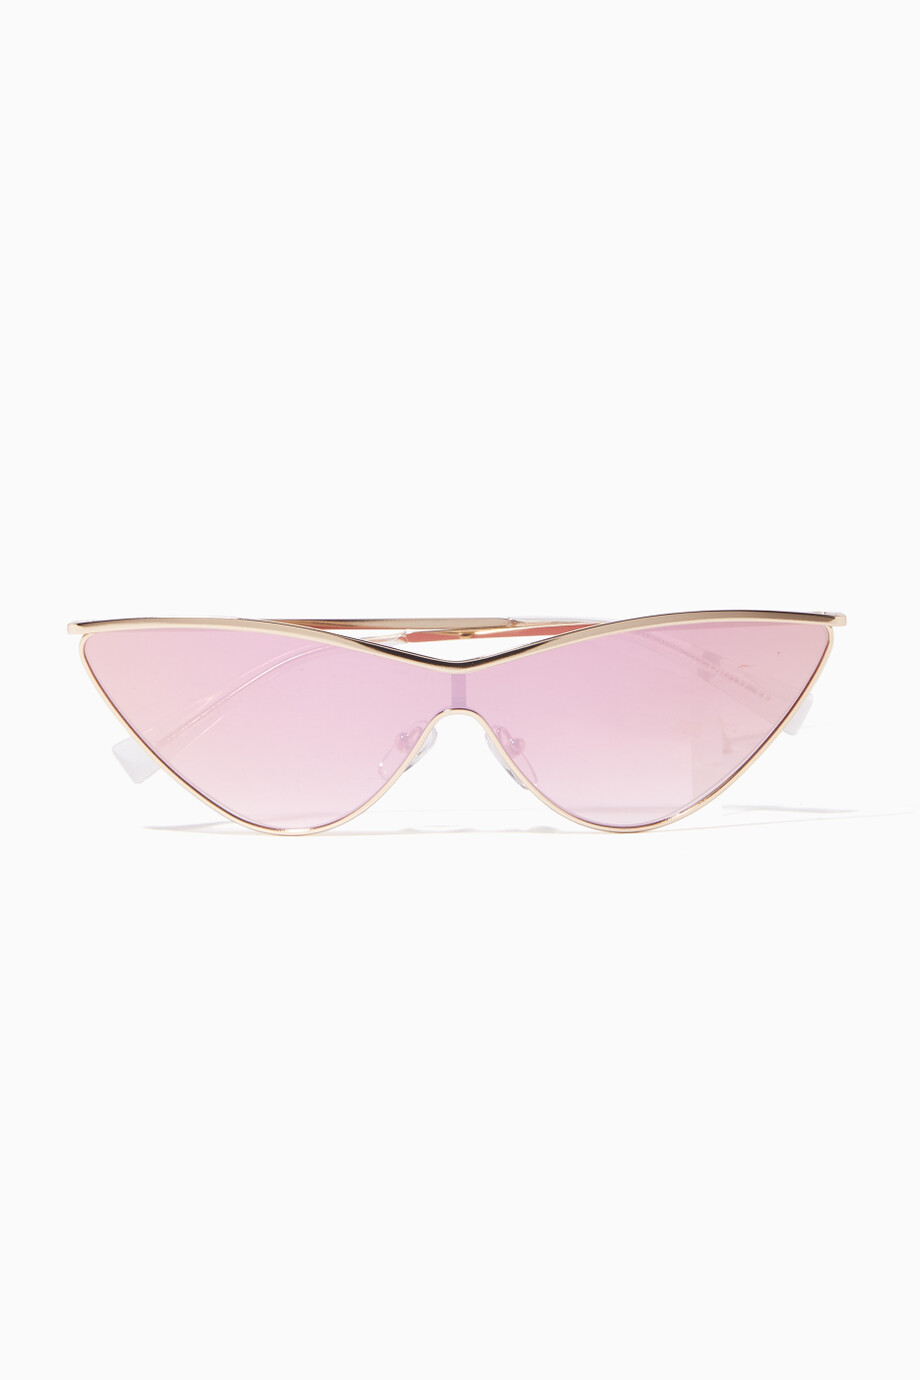 2ee1f415e1 Shop Le Specs Gold Gold The Fugitive Sunglasses for Women